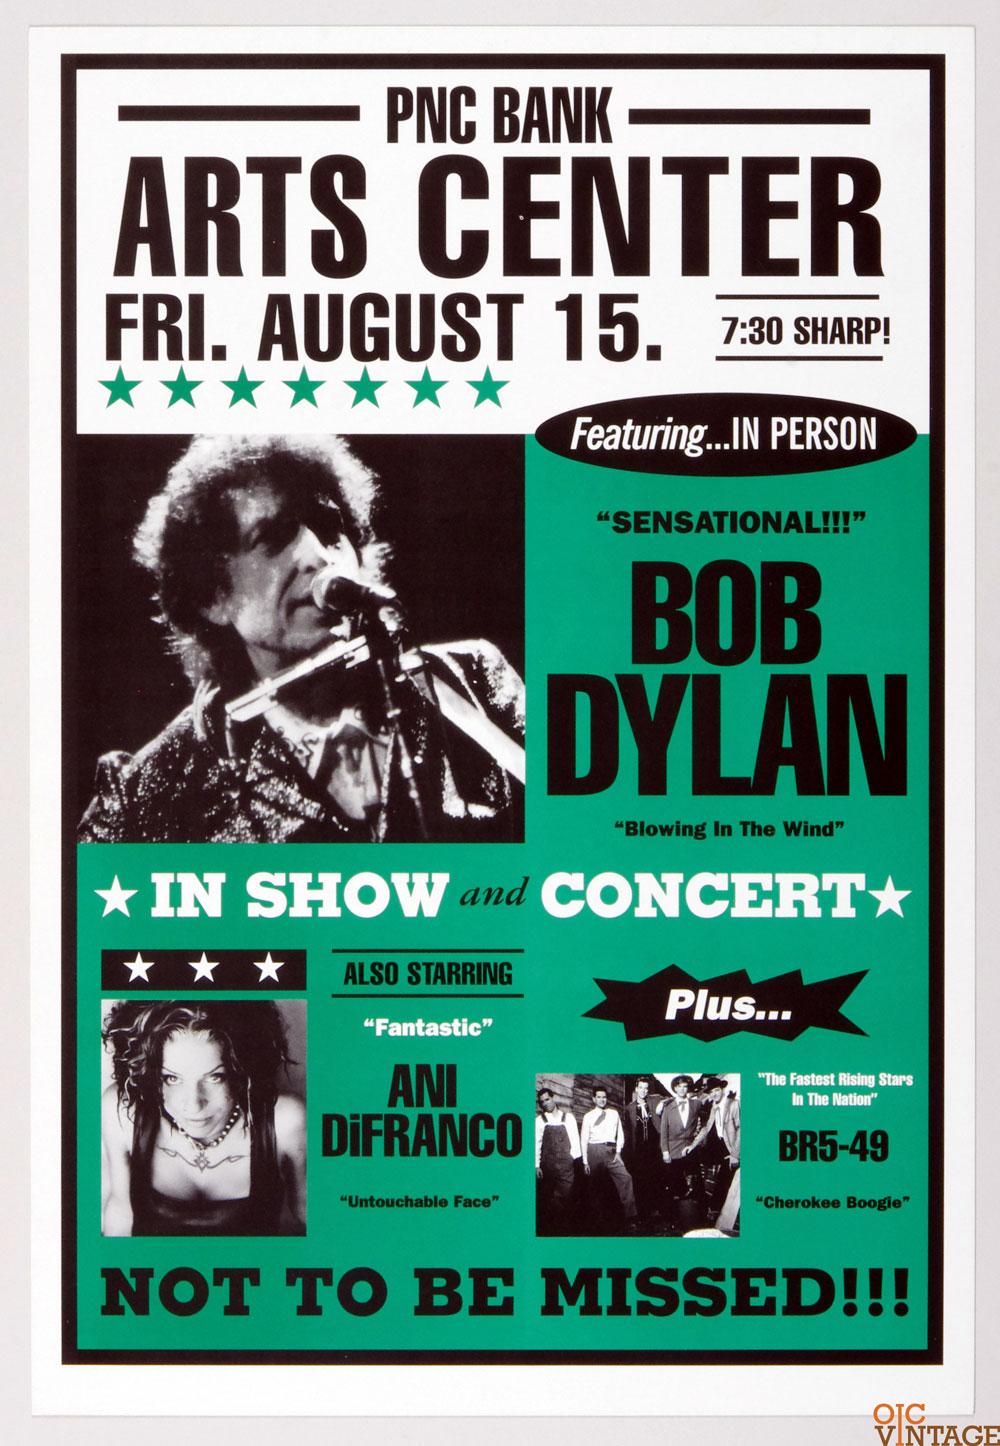 Bob Dylan Poster 1997 Summer Tour Aug 15 Holmdel NJ w/ Ani DiFranco BR5-49